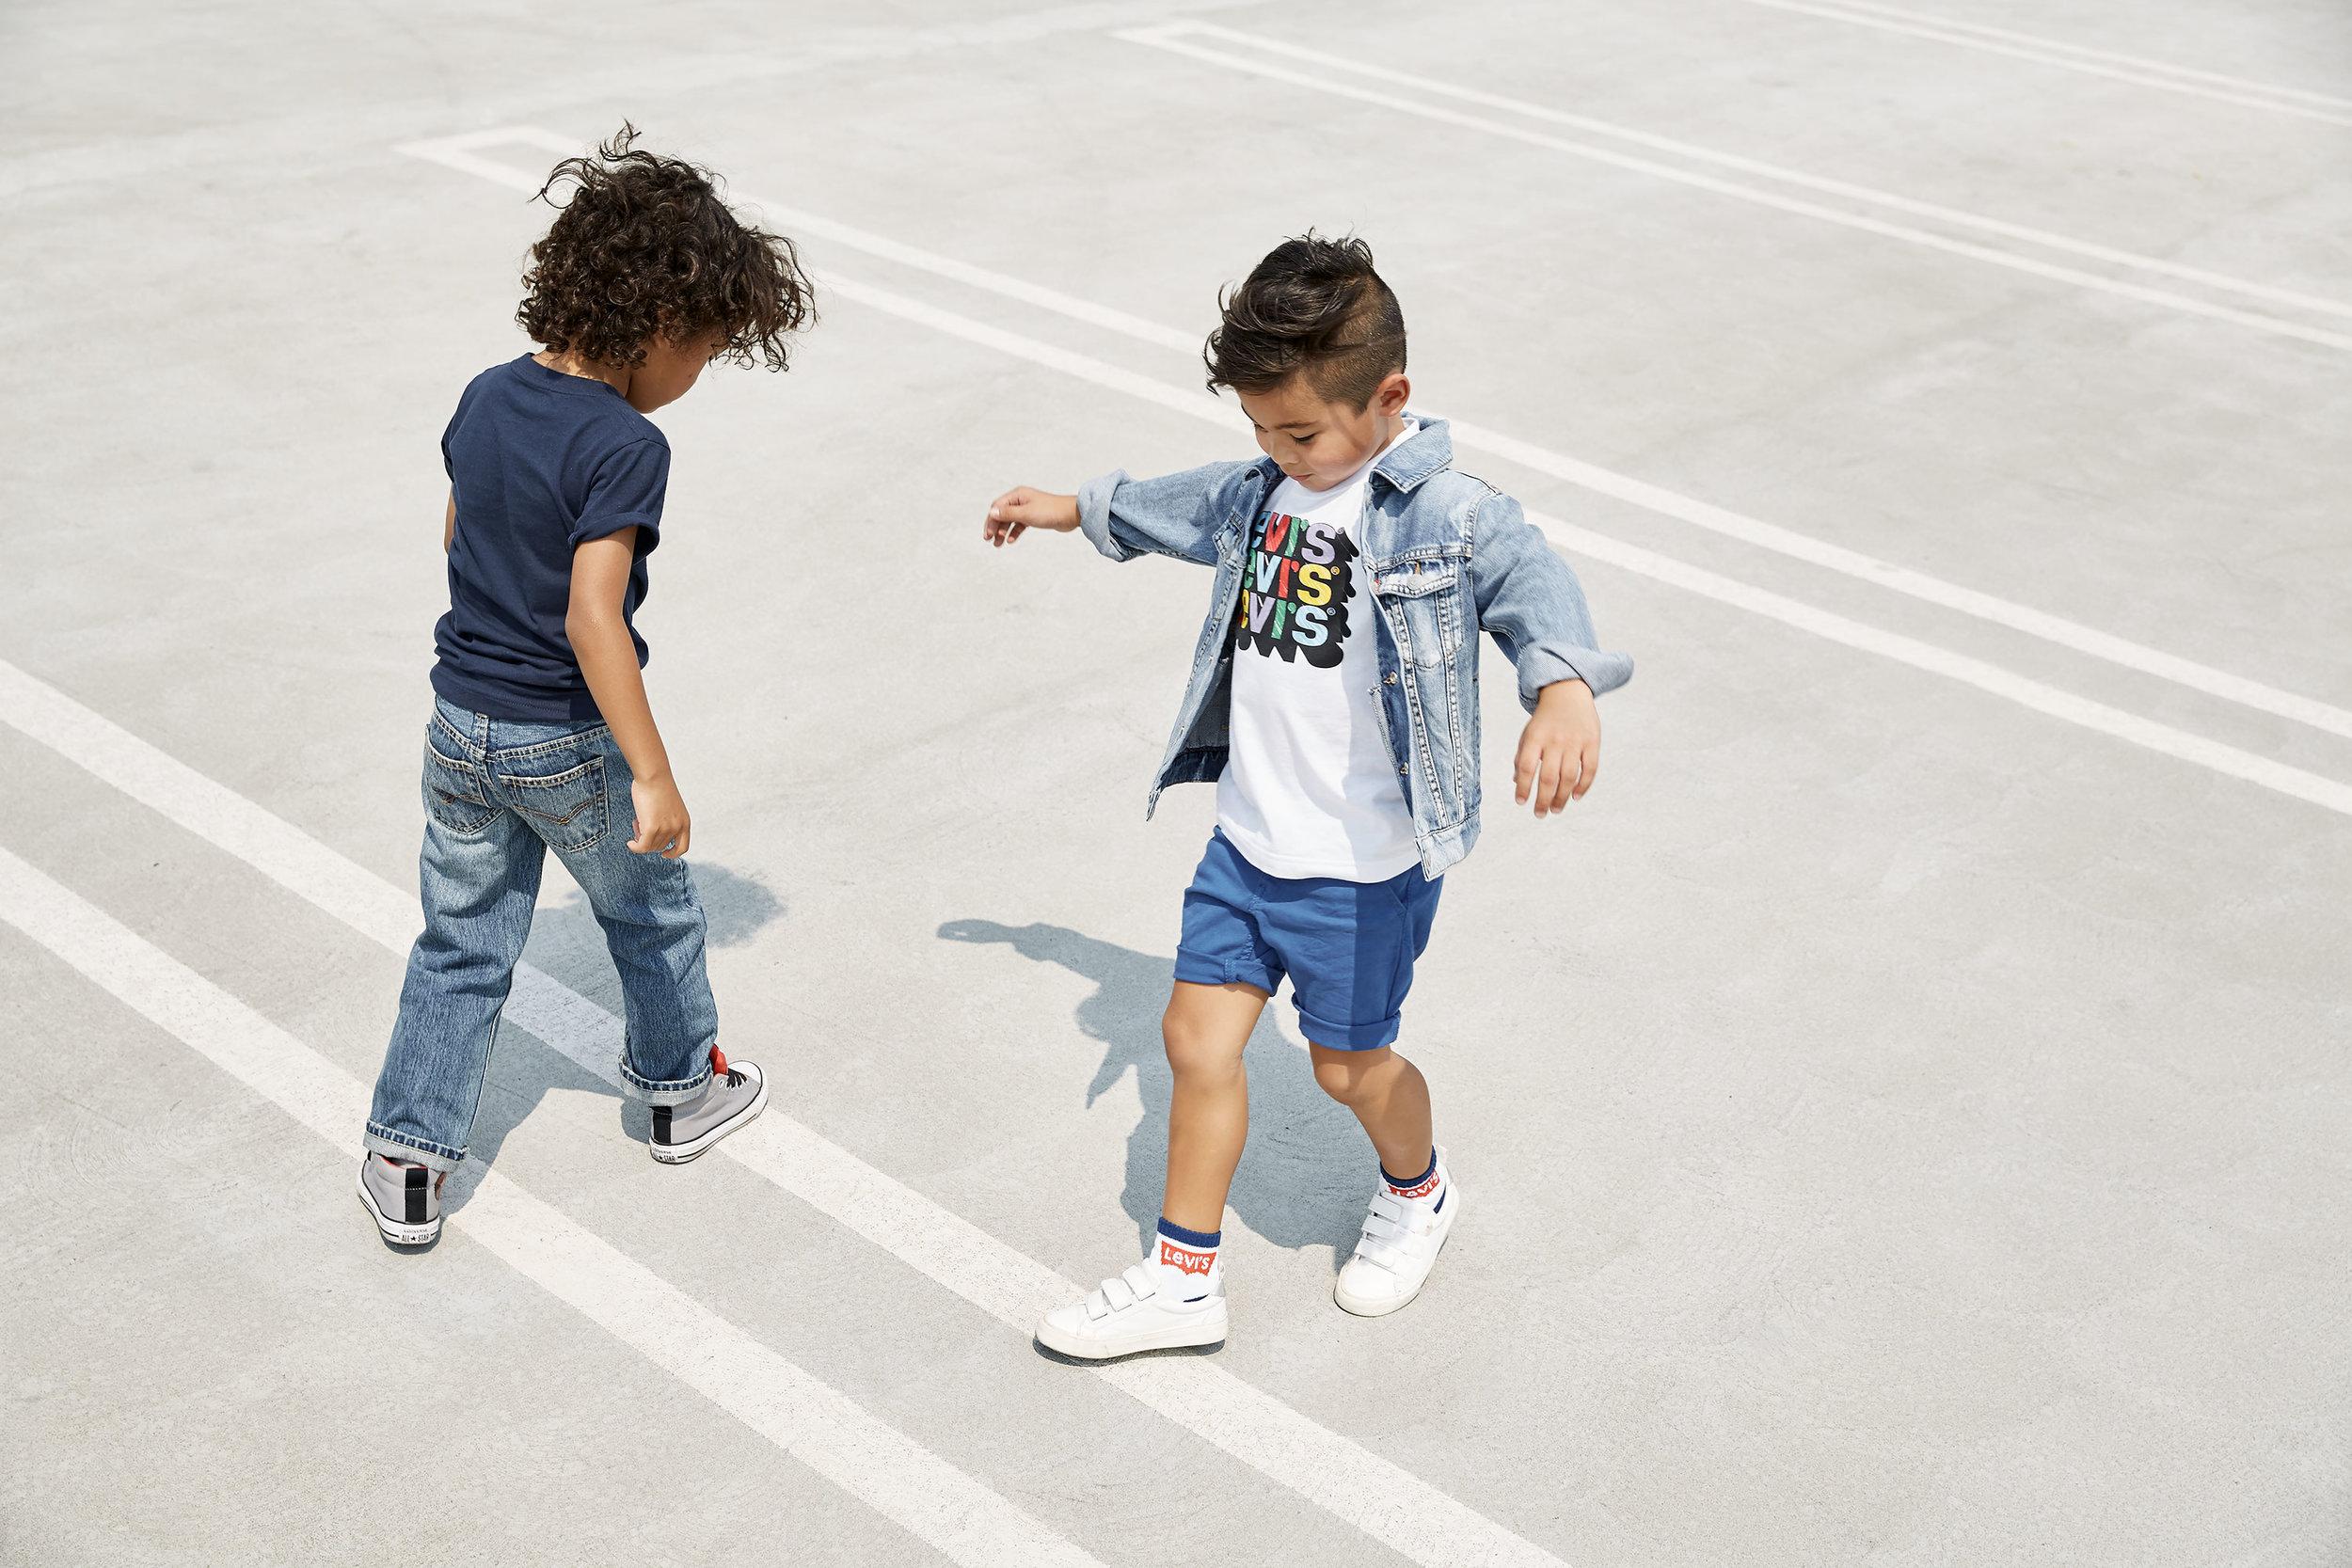 06_19_H1_Kids_Haddad_SlimFitPullShort_6yr_B_0280.jpg